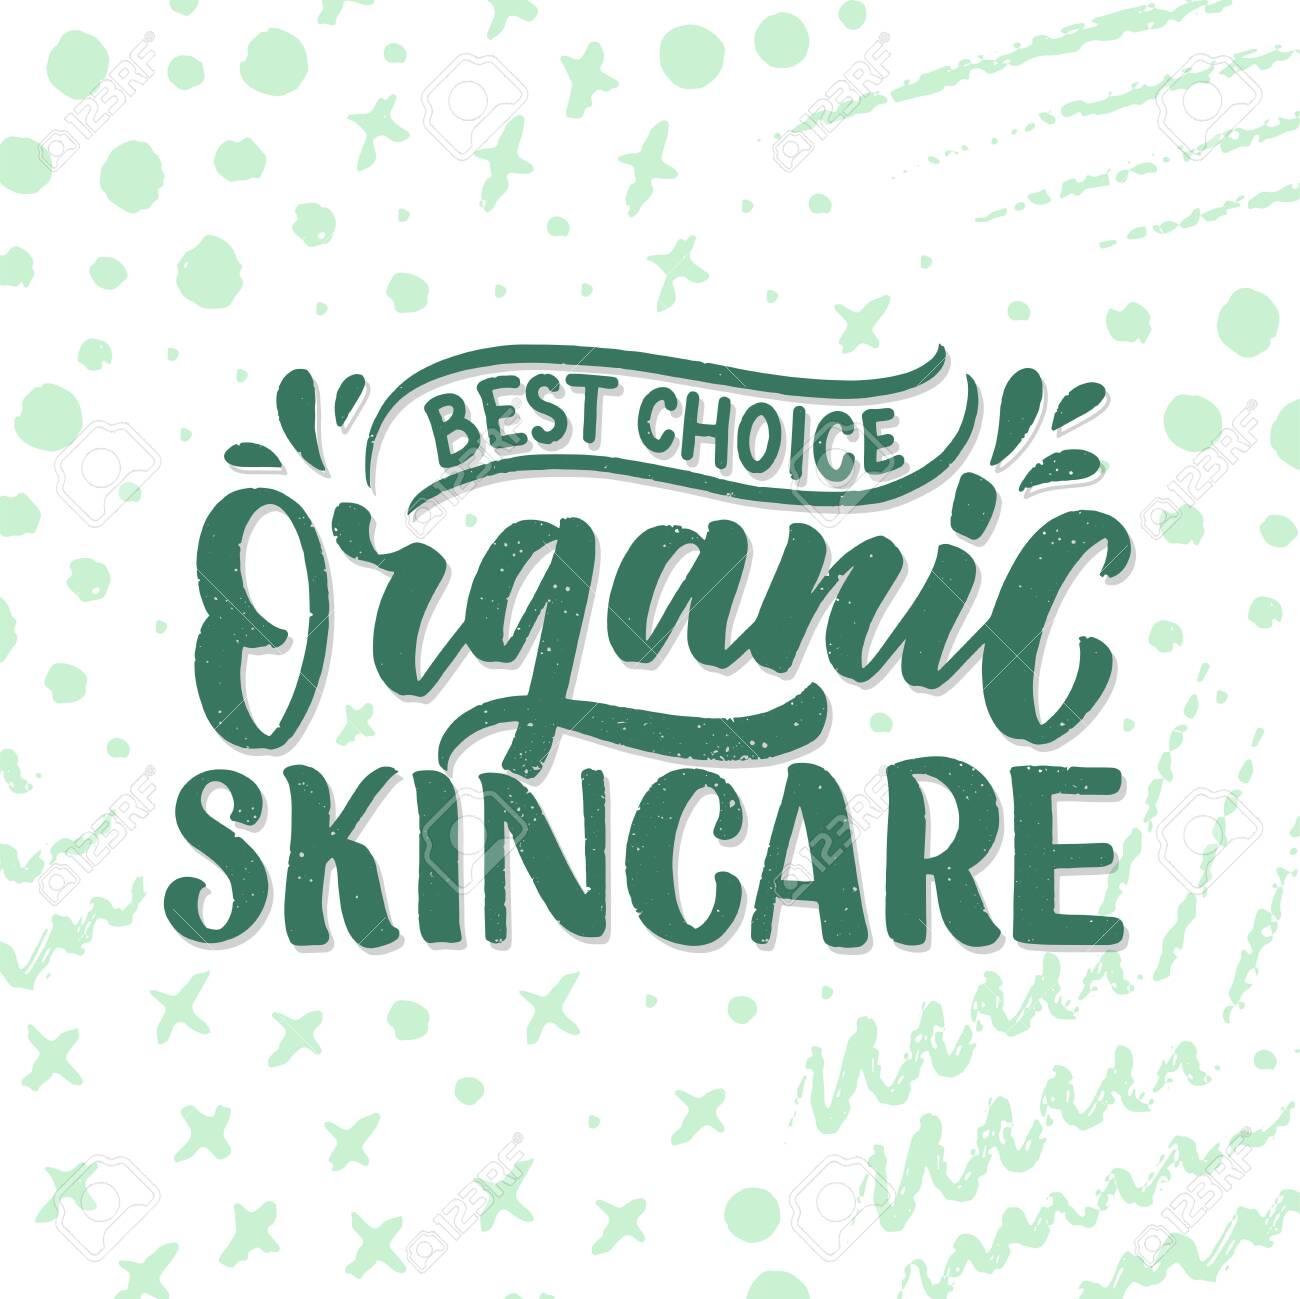 Organic skin care phrase concept banner  Natural cosmetic slogan